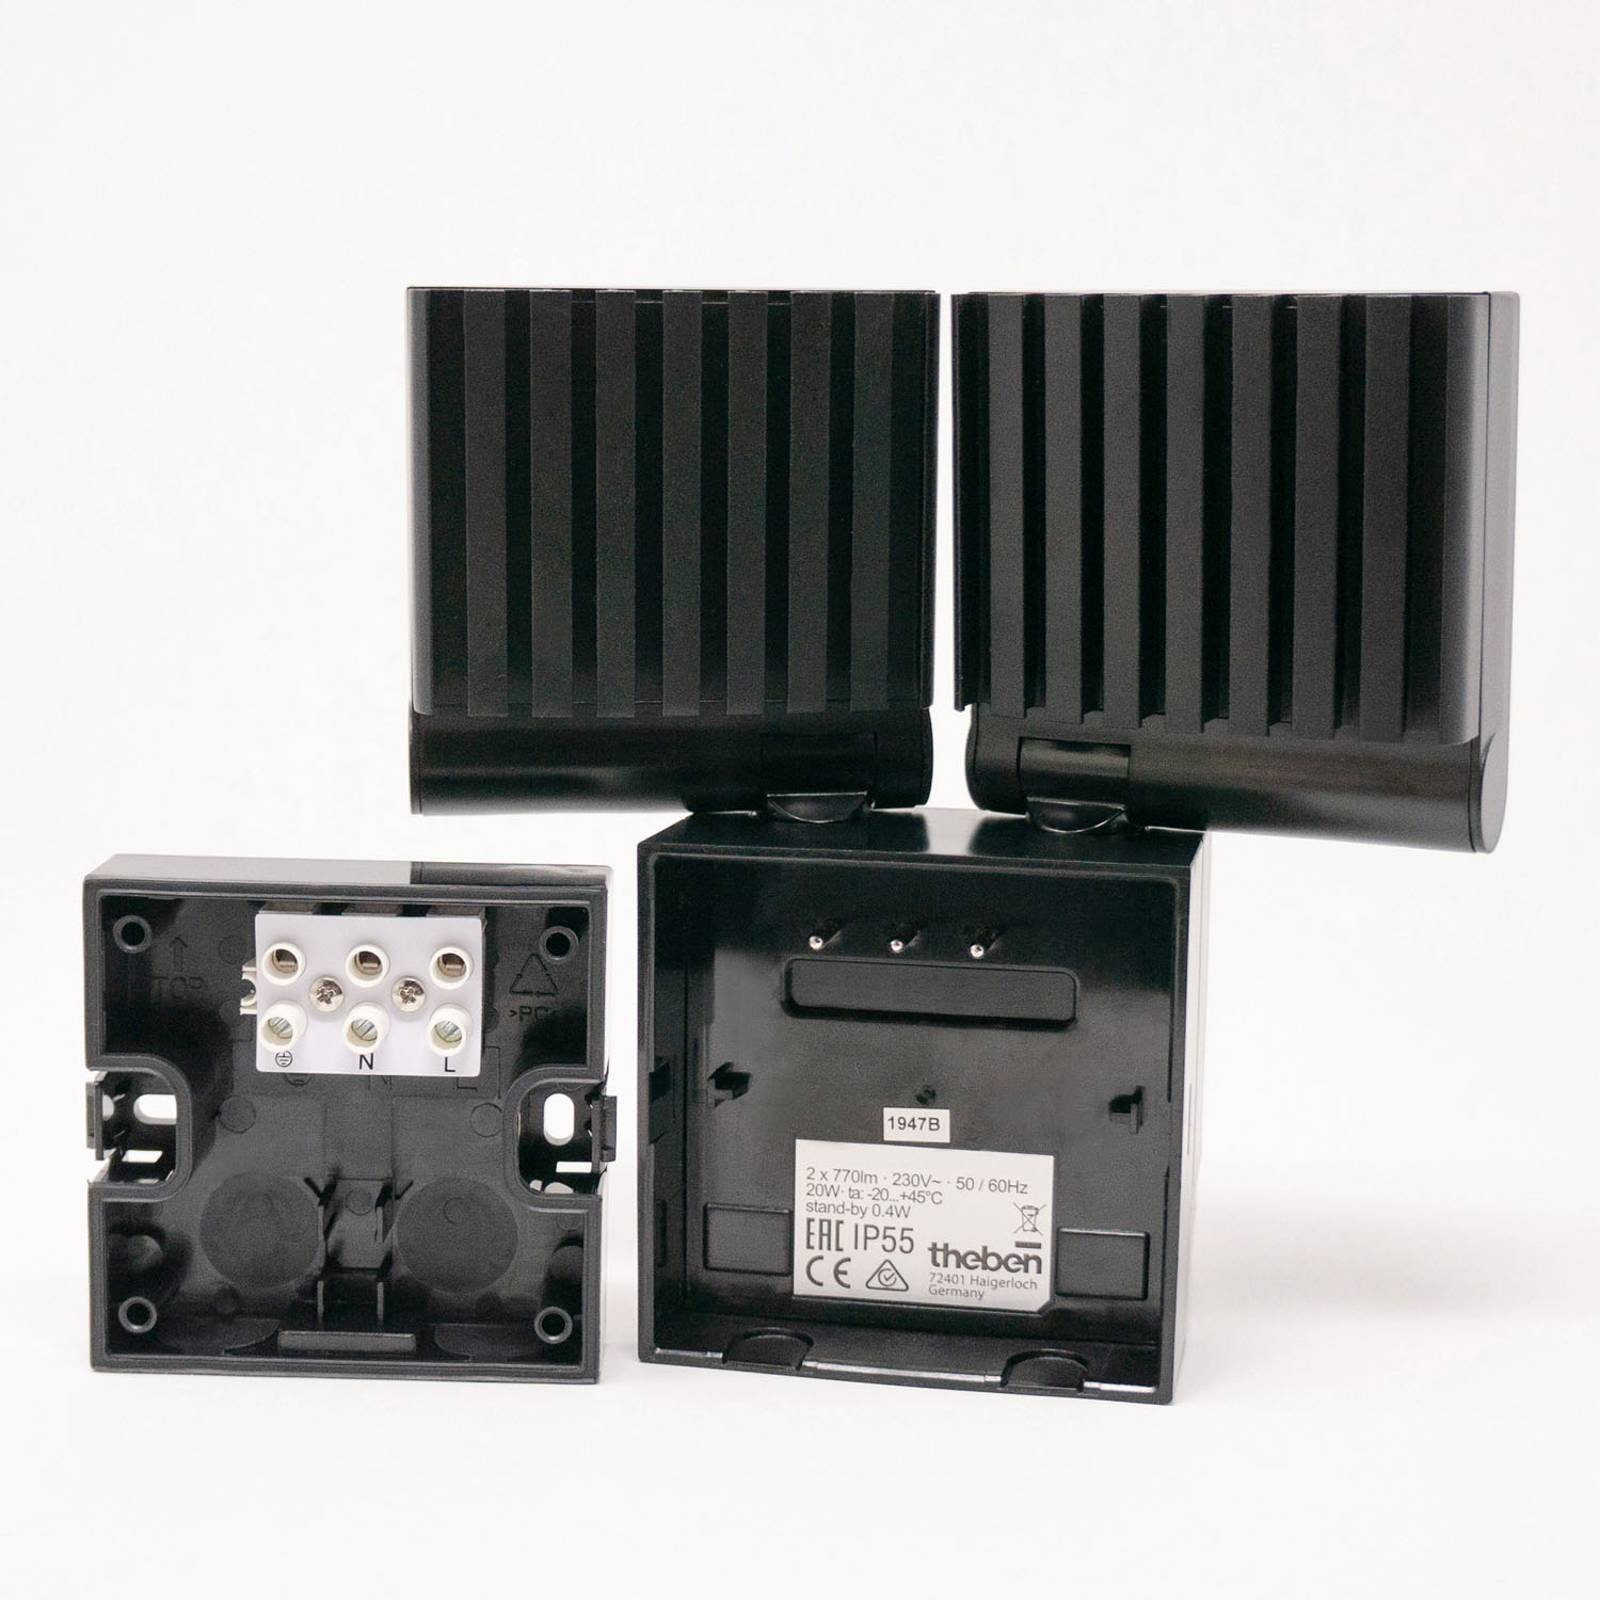 Theben theLeda S20 spot sensor 4 000 K svart